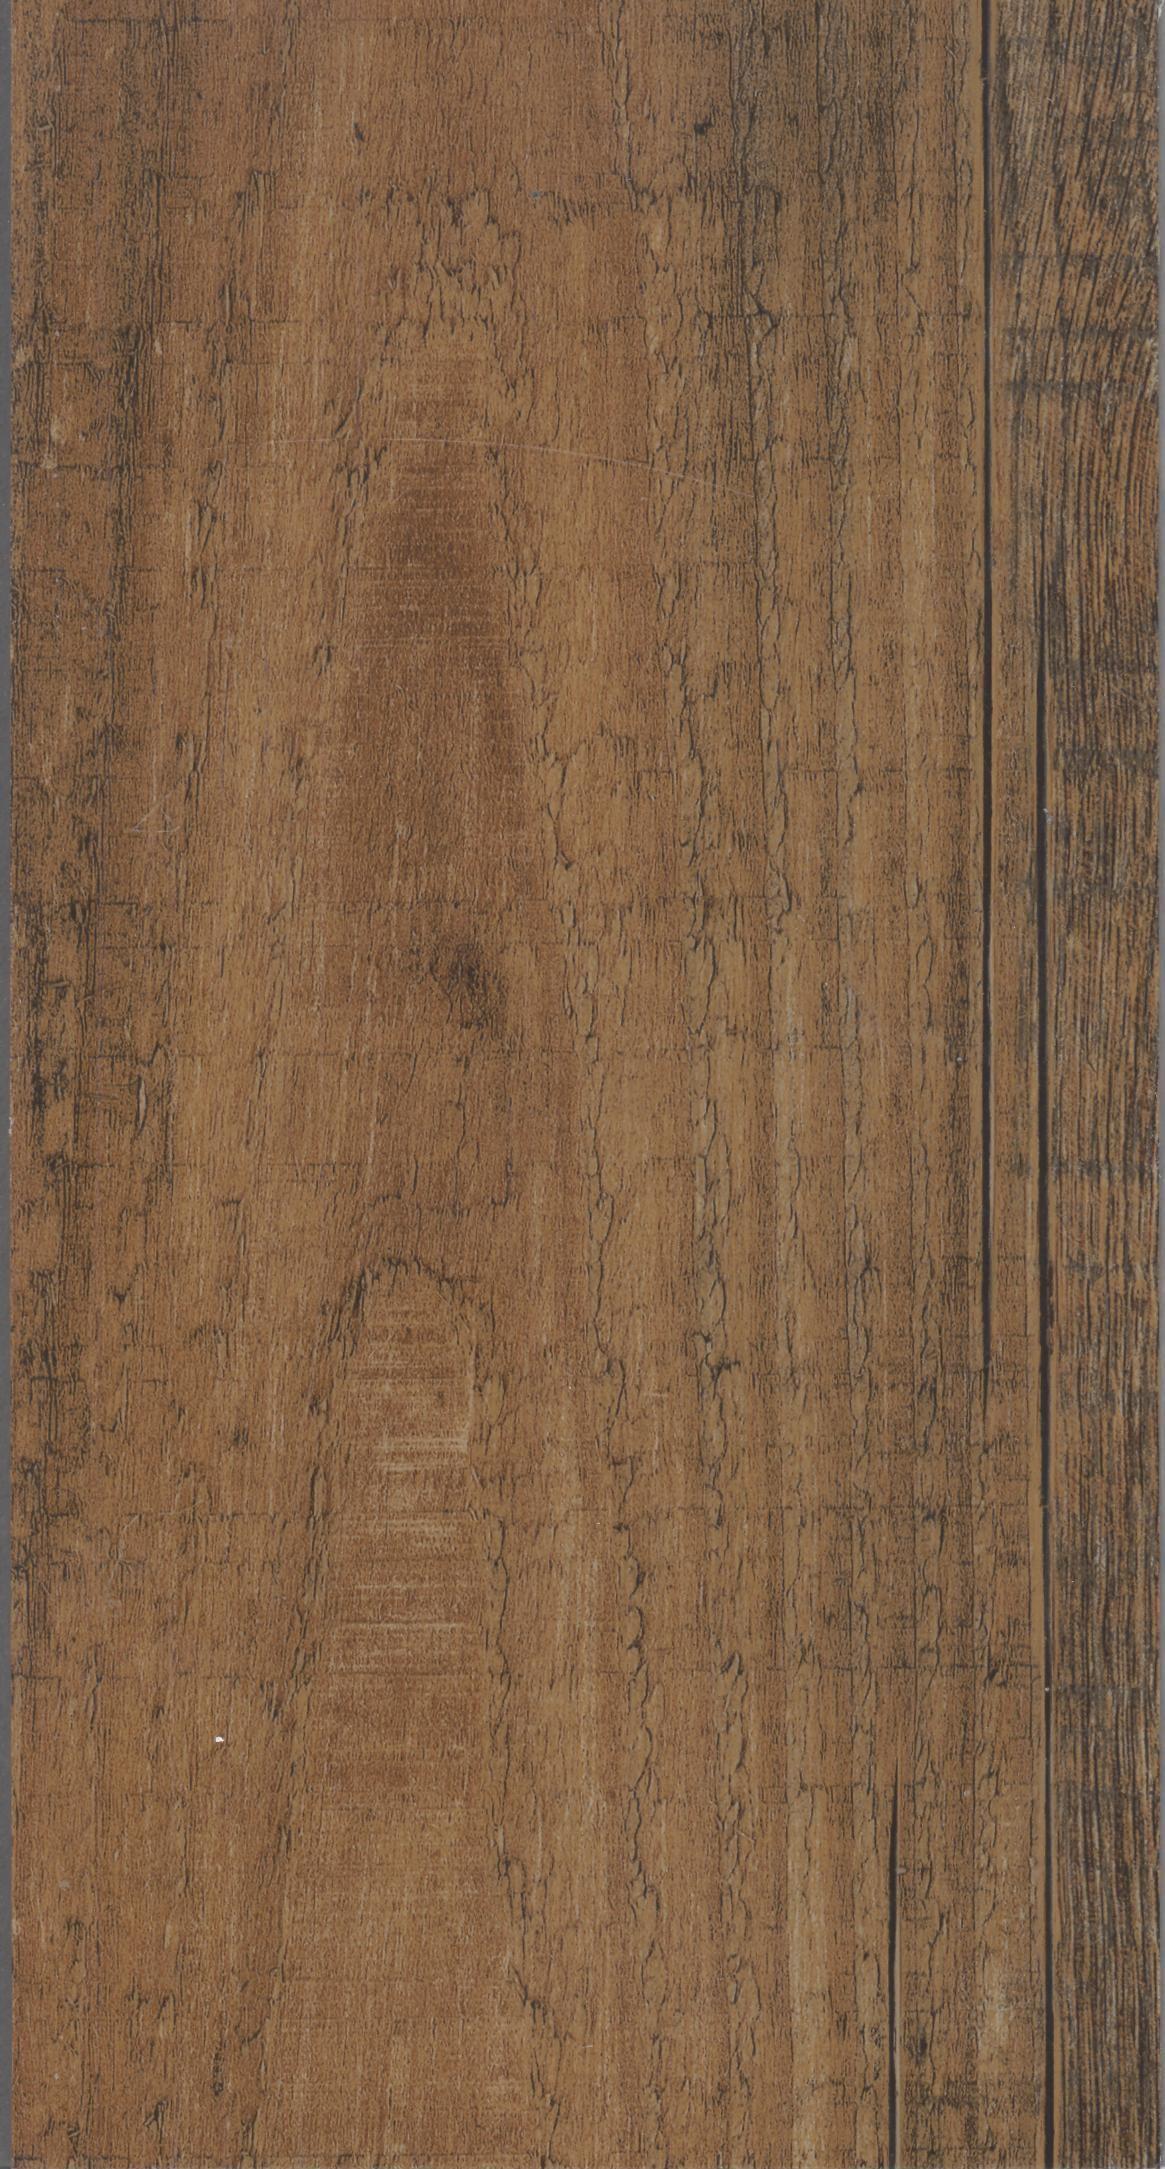 Earthwerks Lwa 3623 Vinyl Flooring